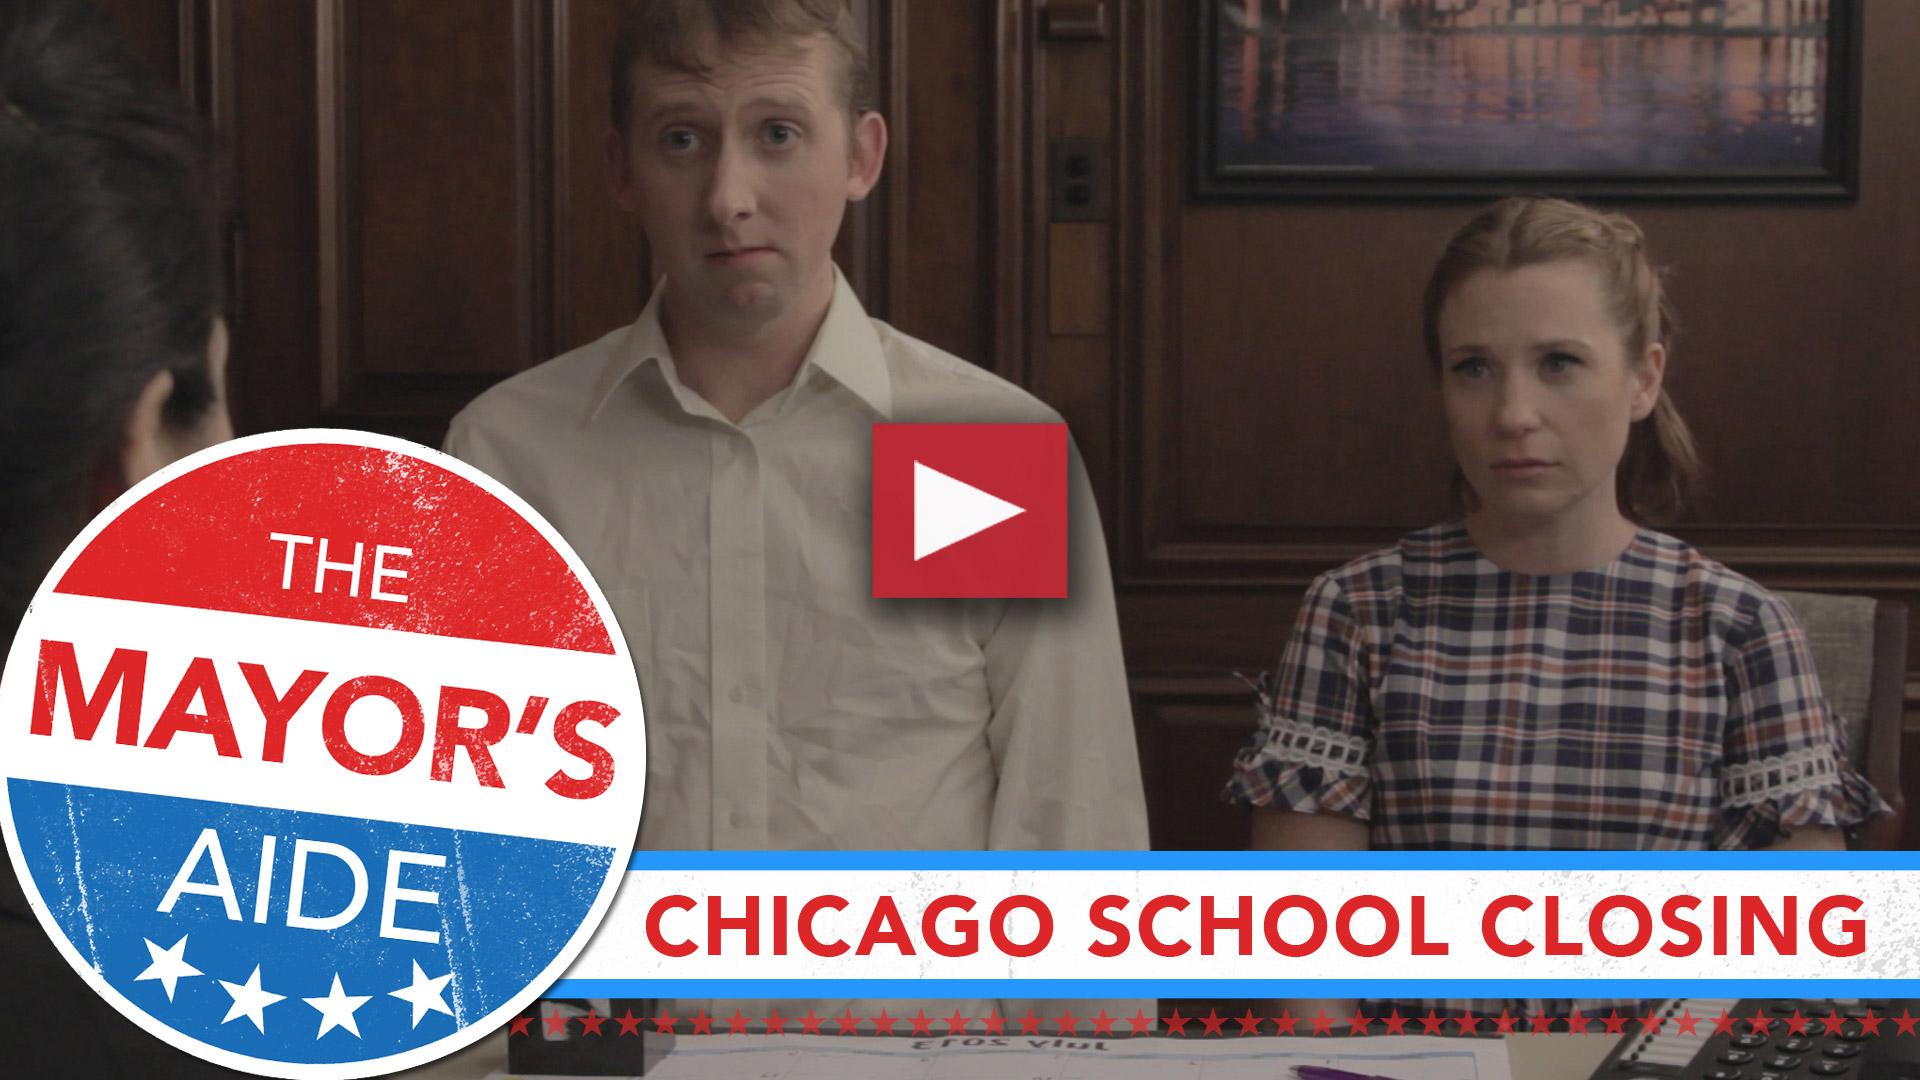 The Mayor's Aide - Chicago School Closings